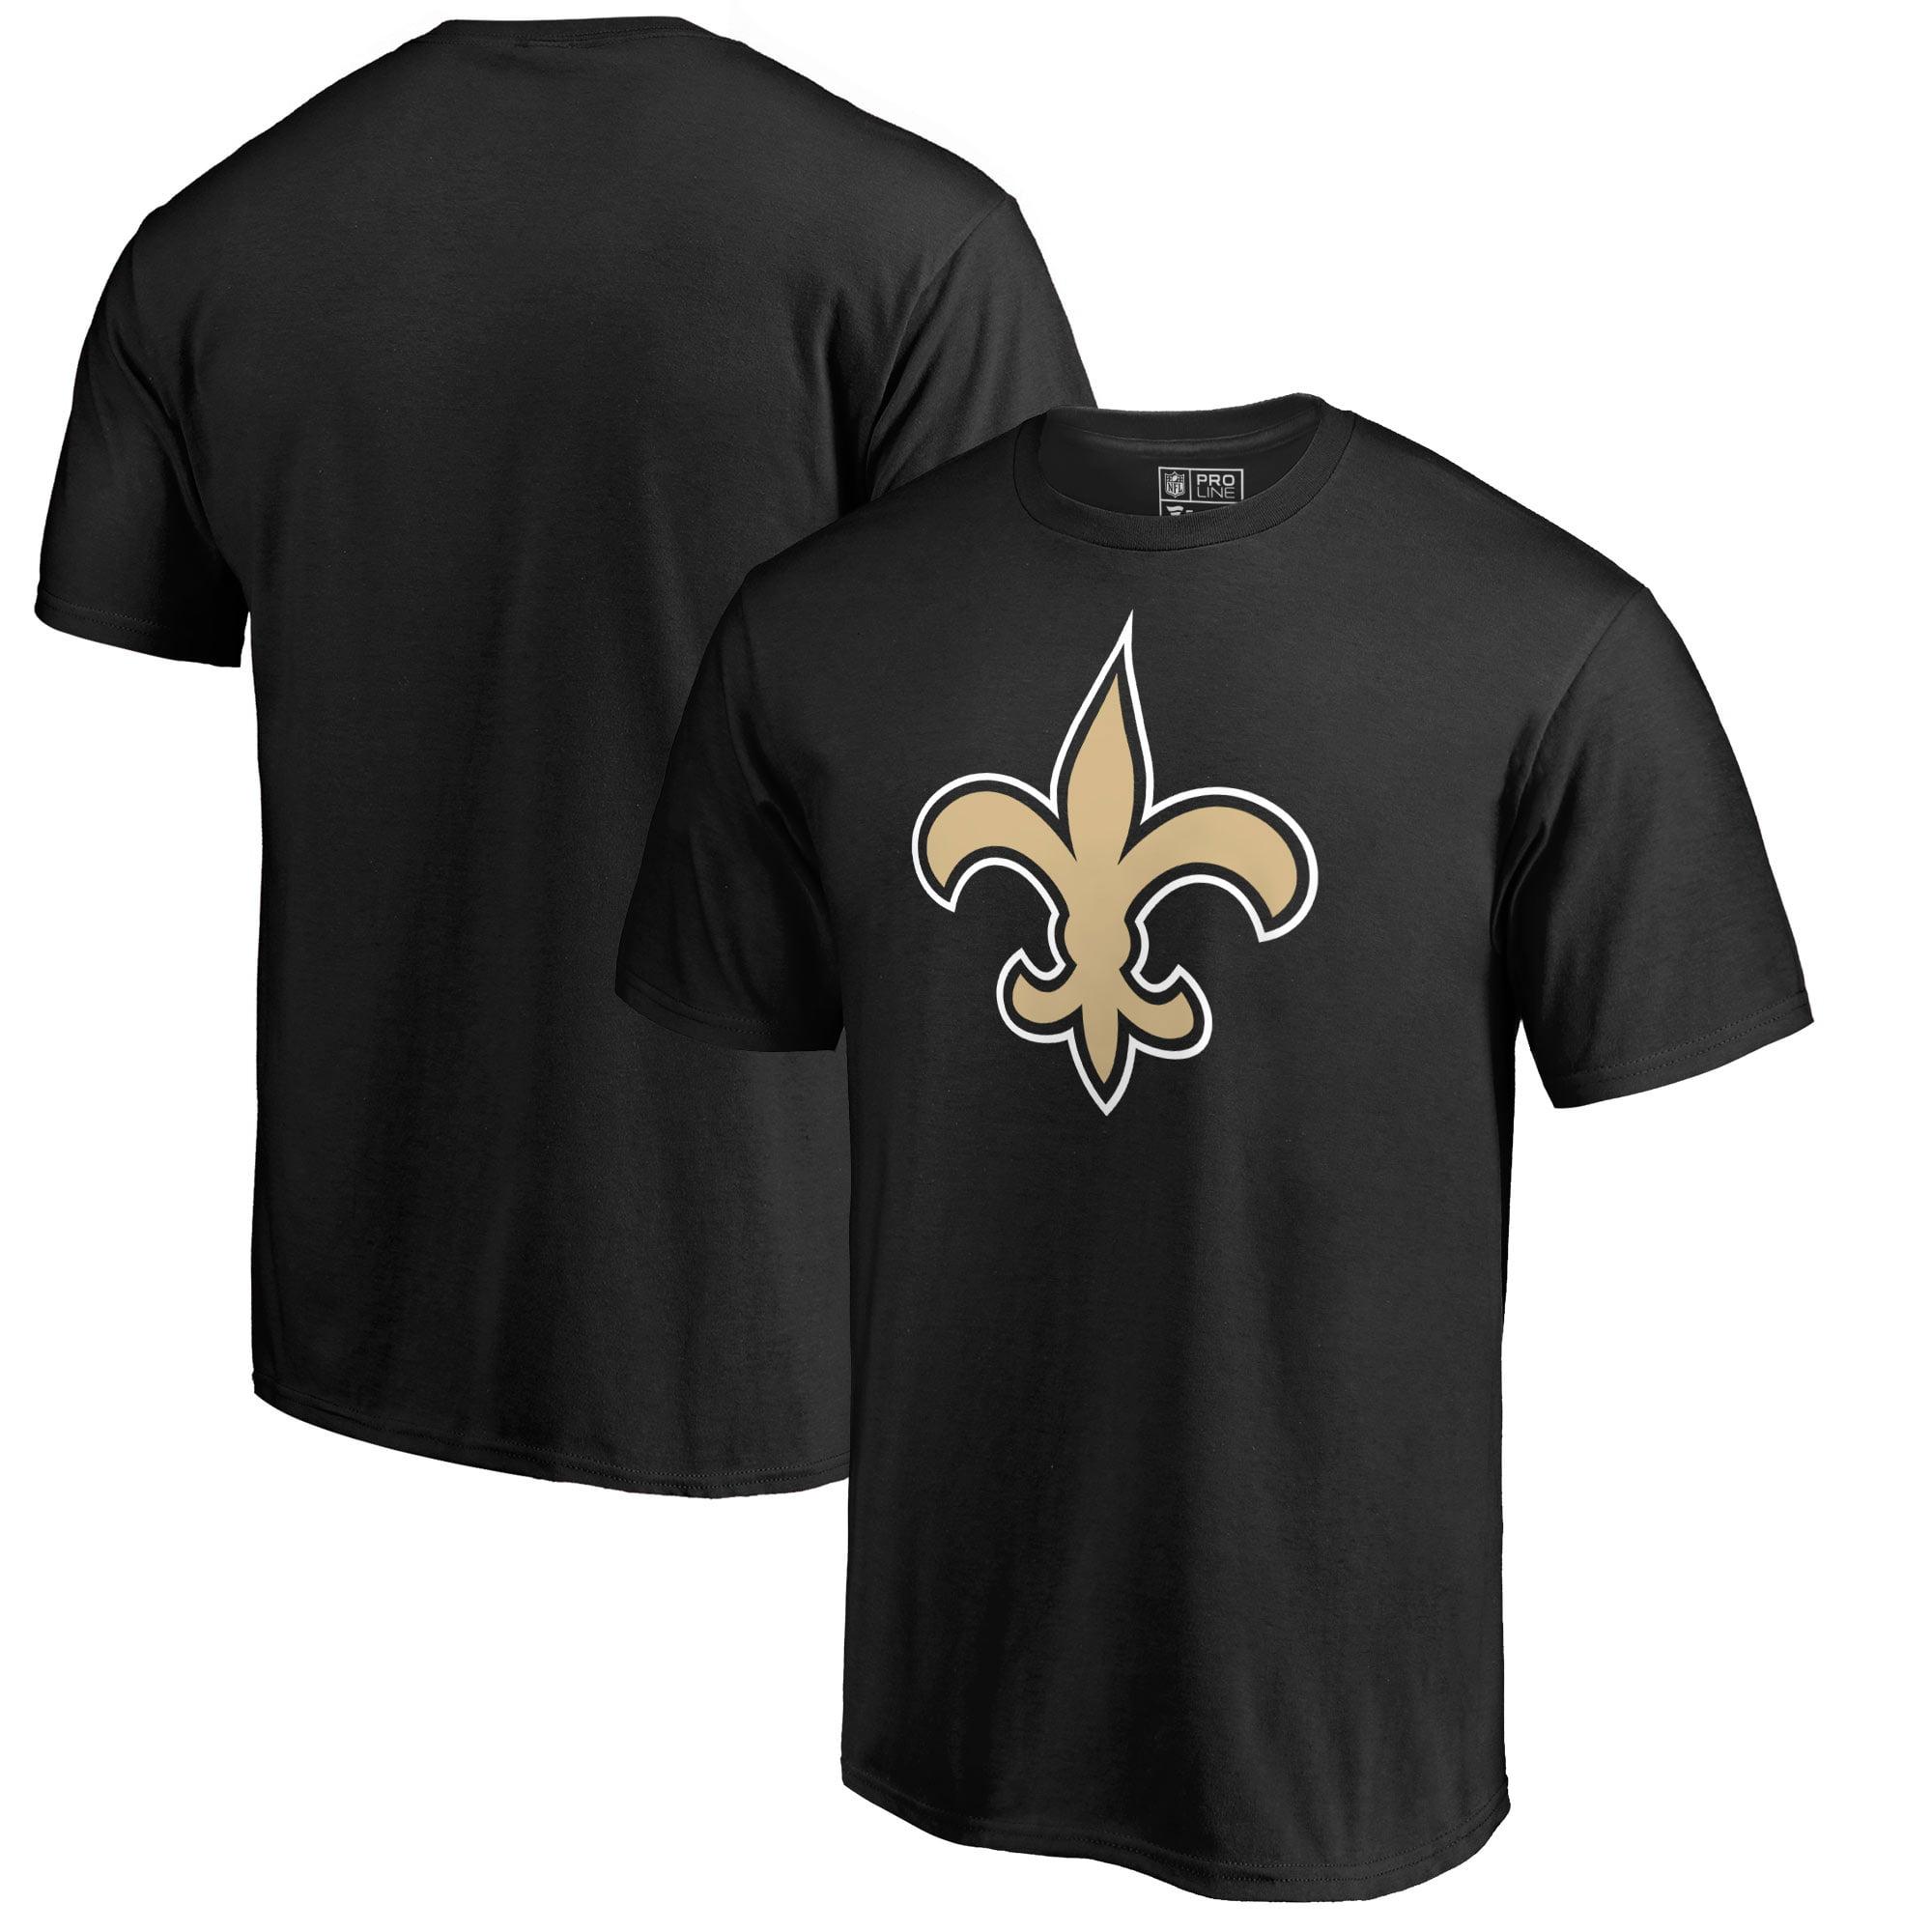 New Orleans Saints NFL Pro Line by Fanatics Branded Primary Team Logo T-Shirt - Black